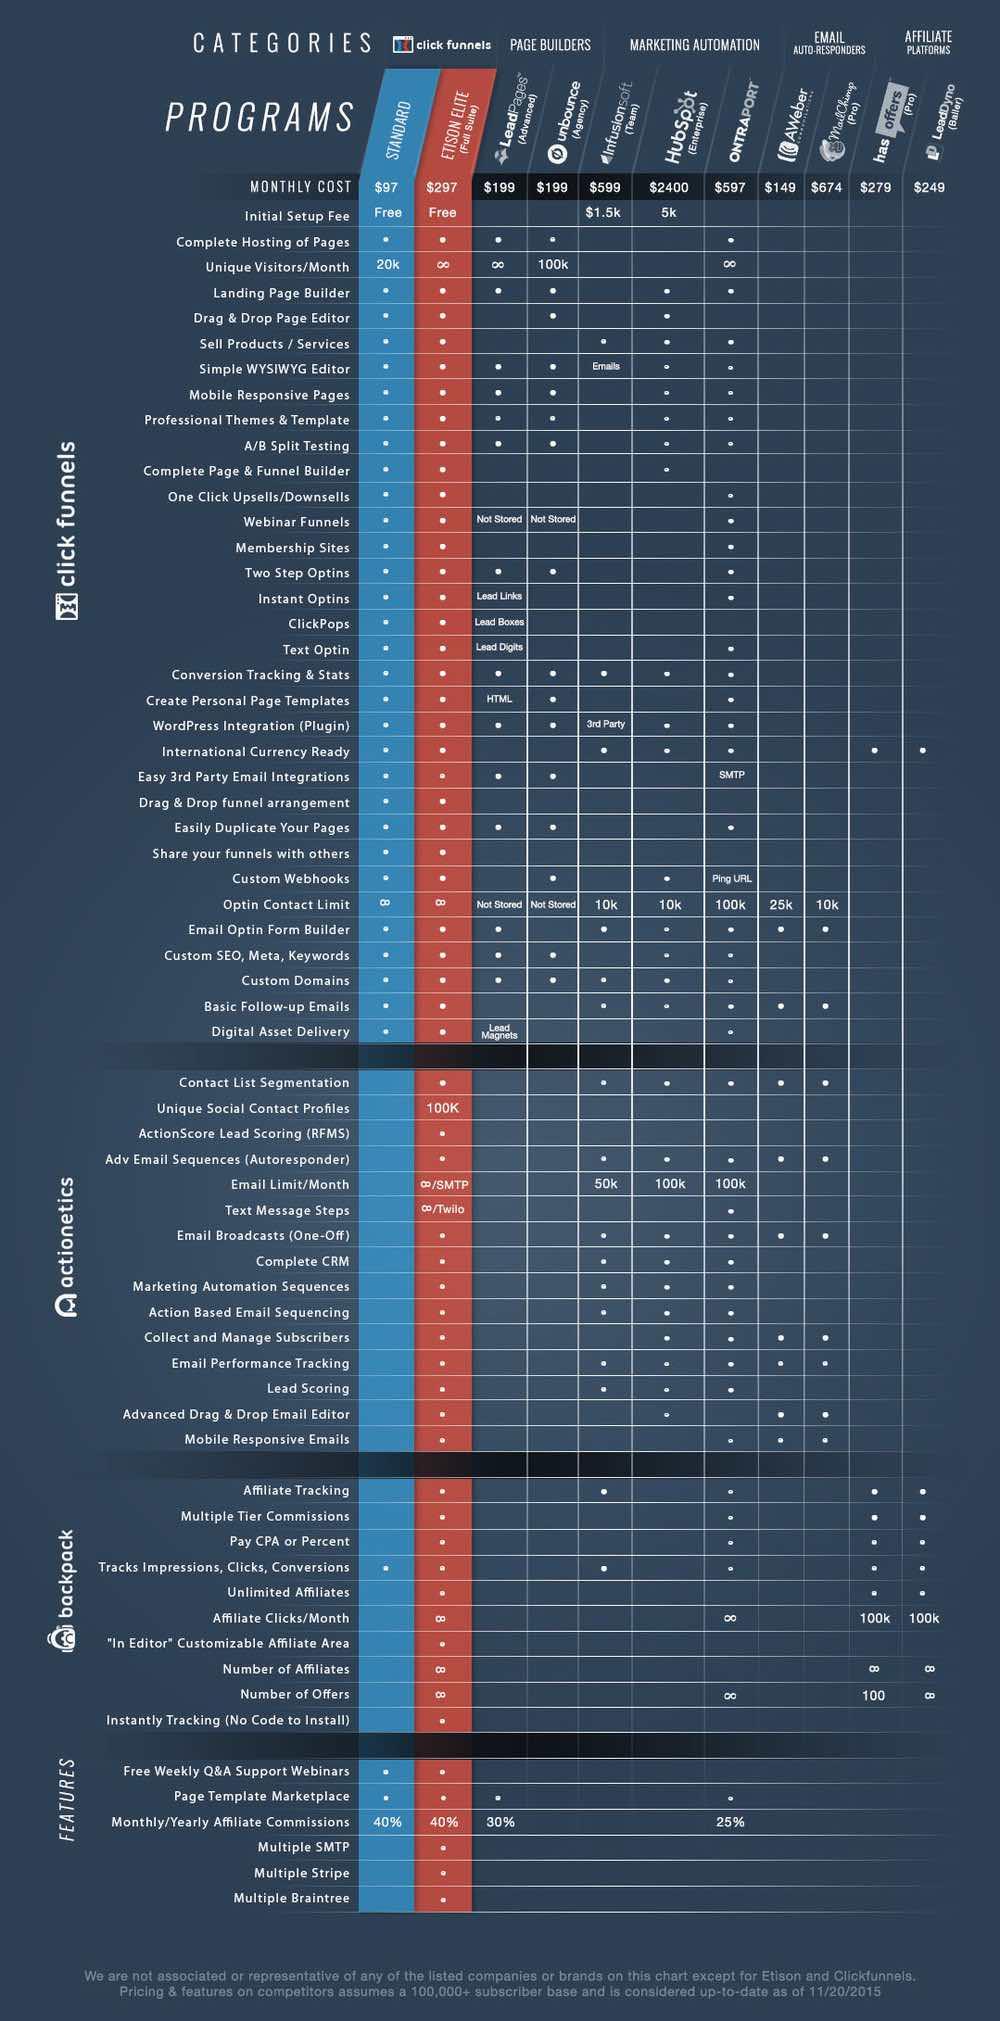 clickfunnels-pricing-comp-chart-clickfunnels-cost-2019-beyond2.jpg